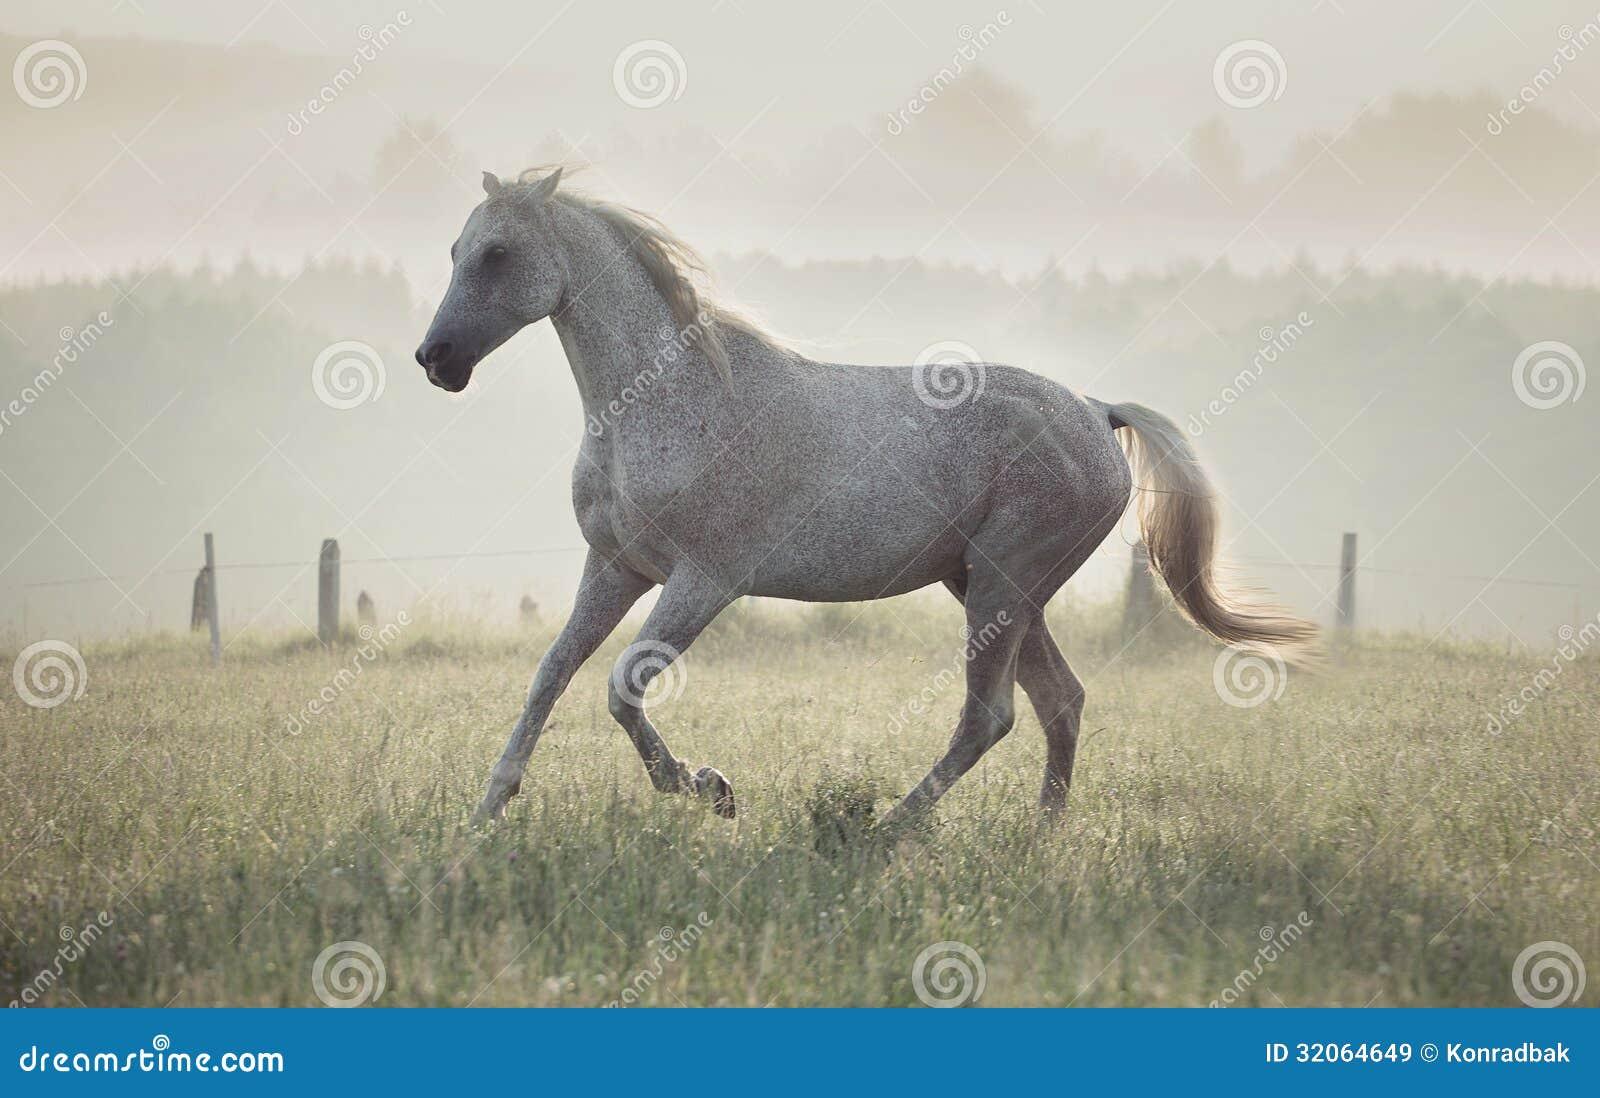 prickig häst